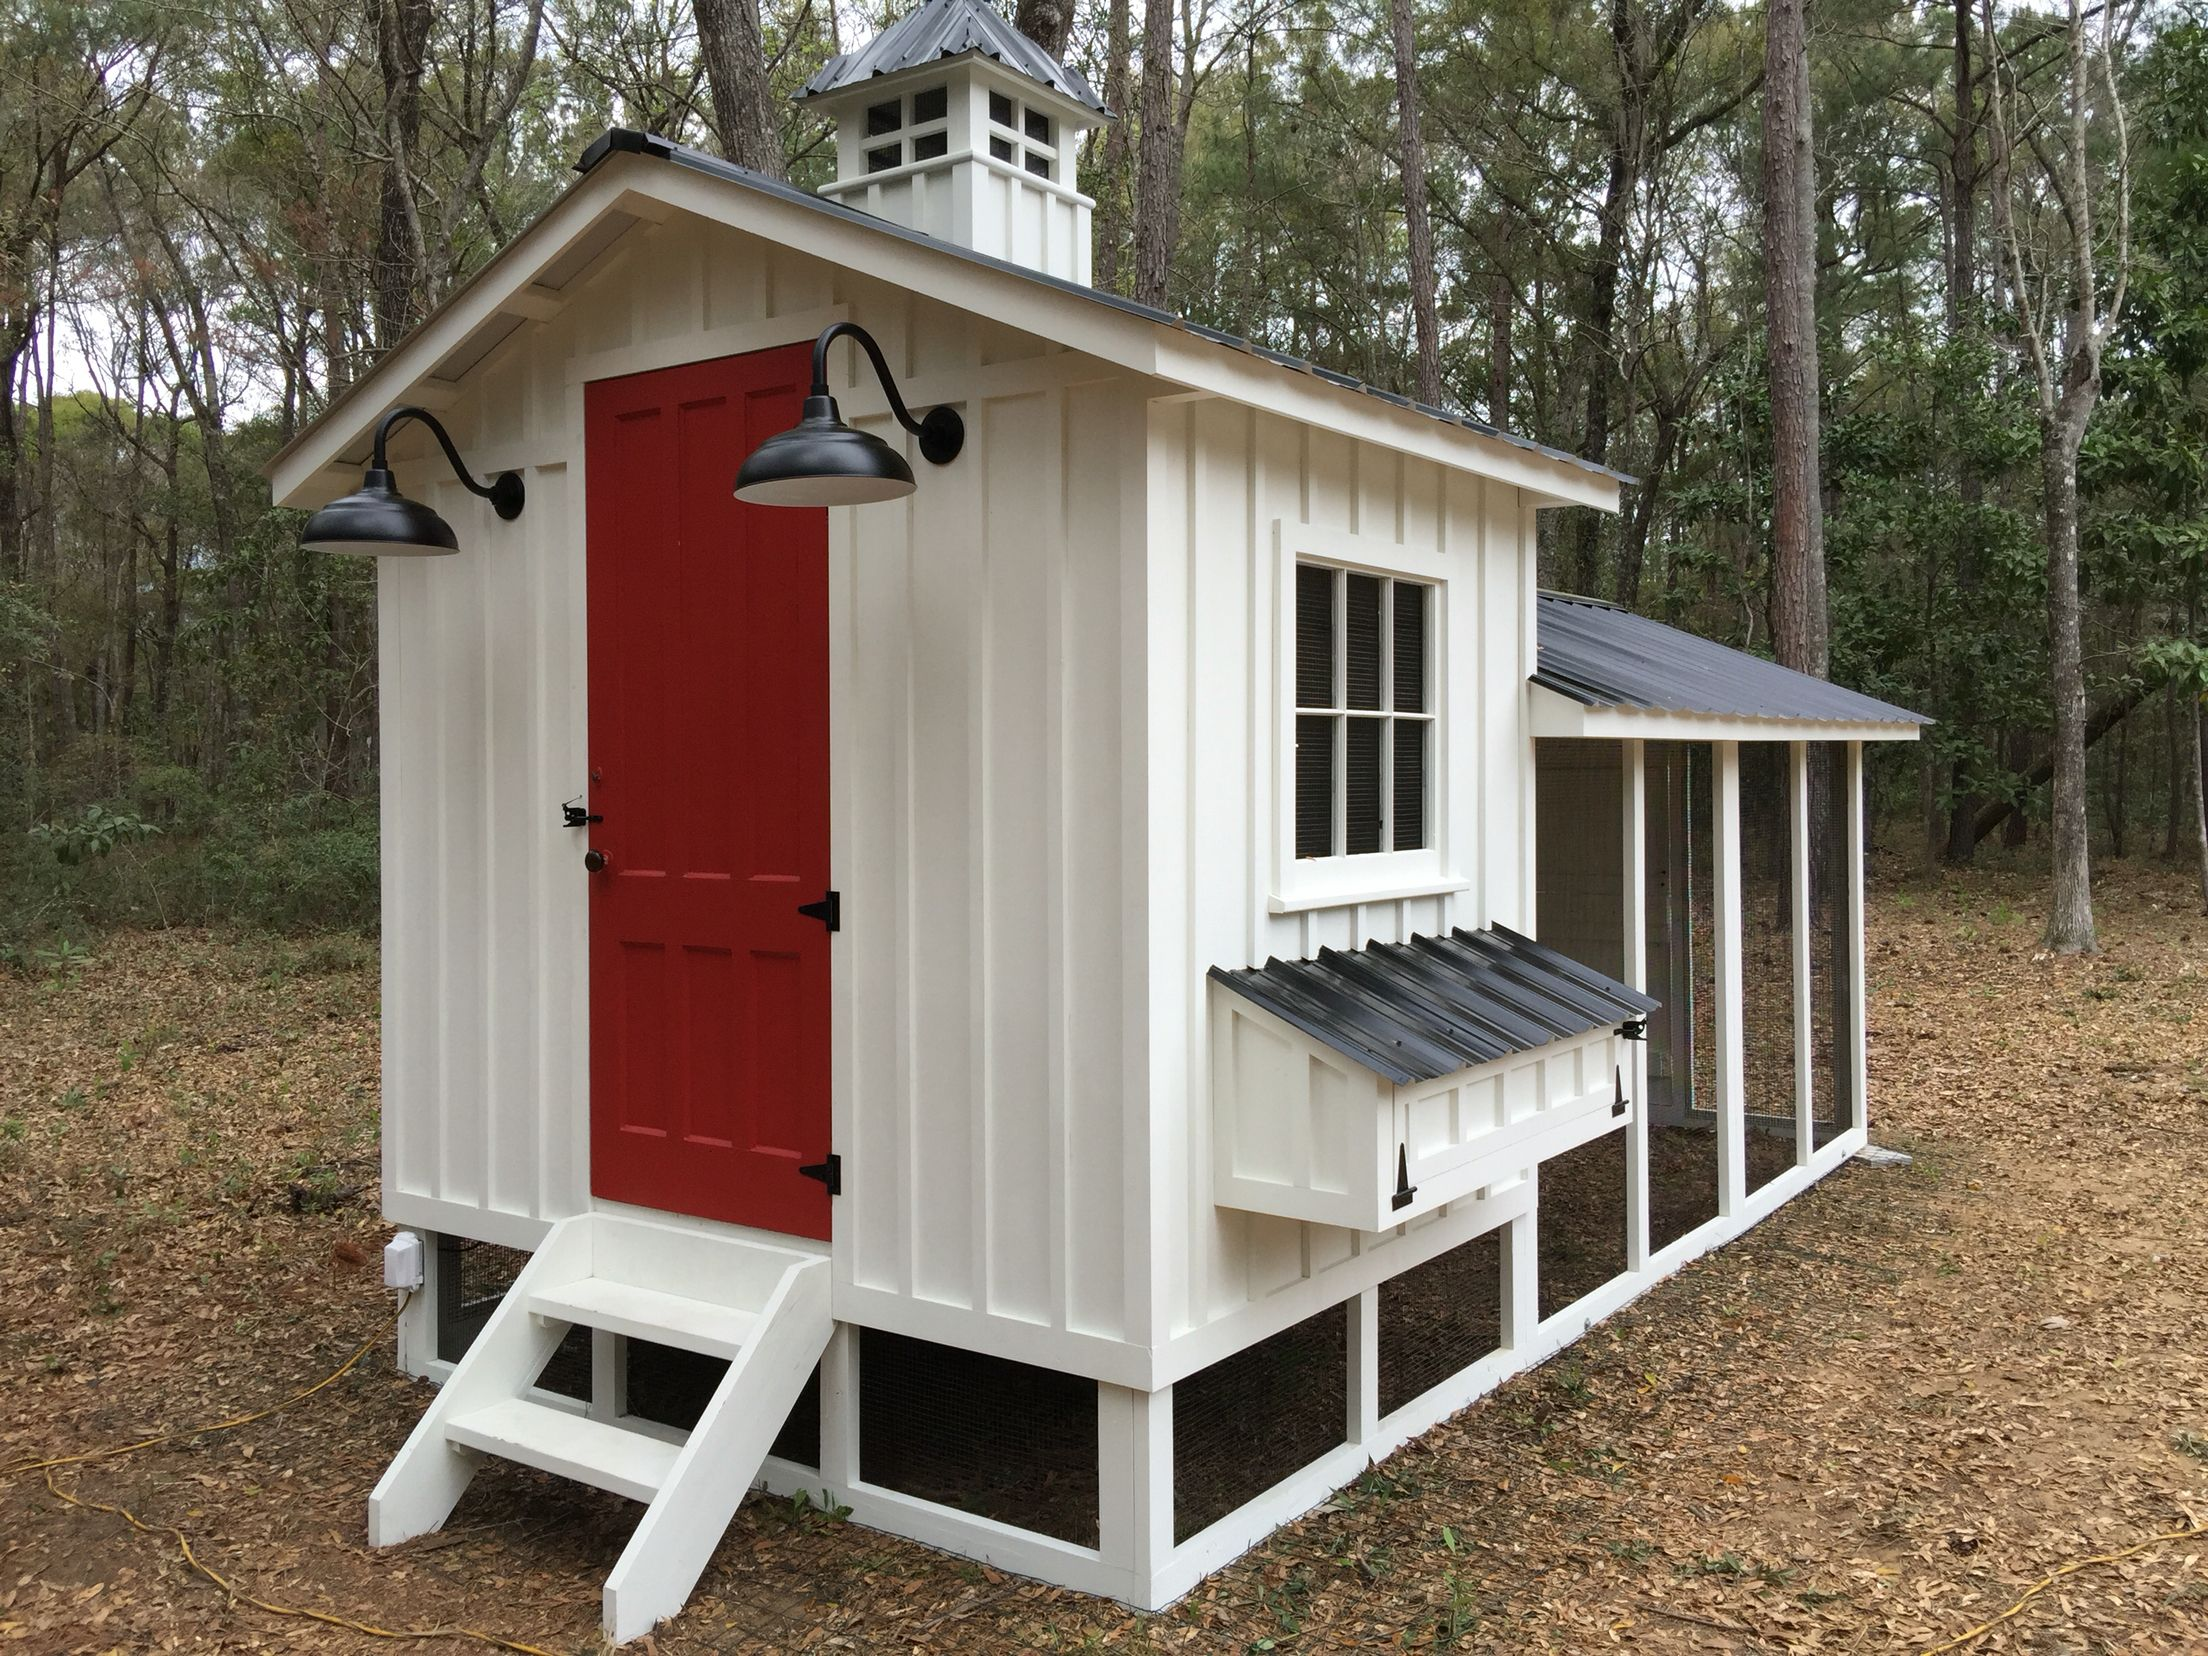 17 Best Ideas About Chicken Coop Plans On Pinterest Backyard